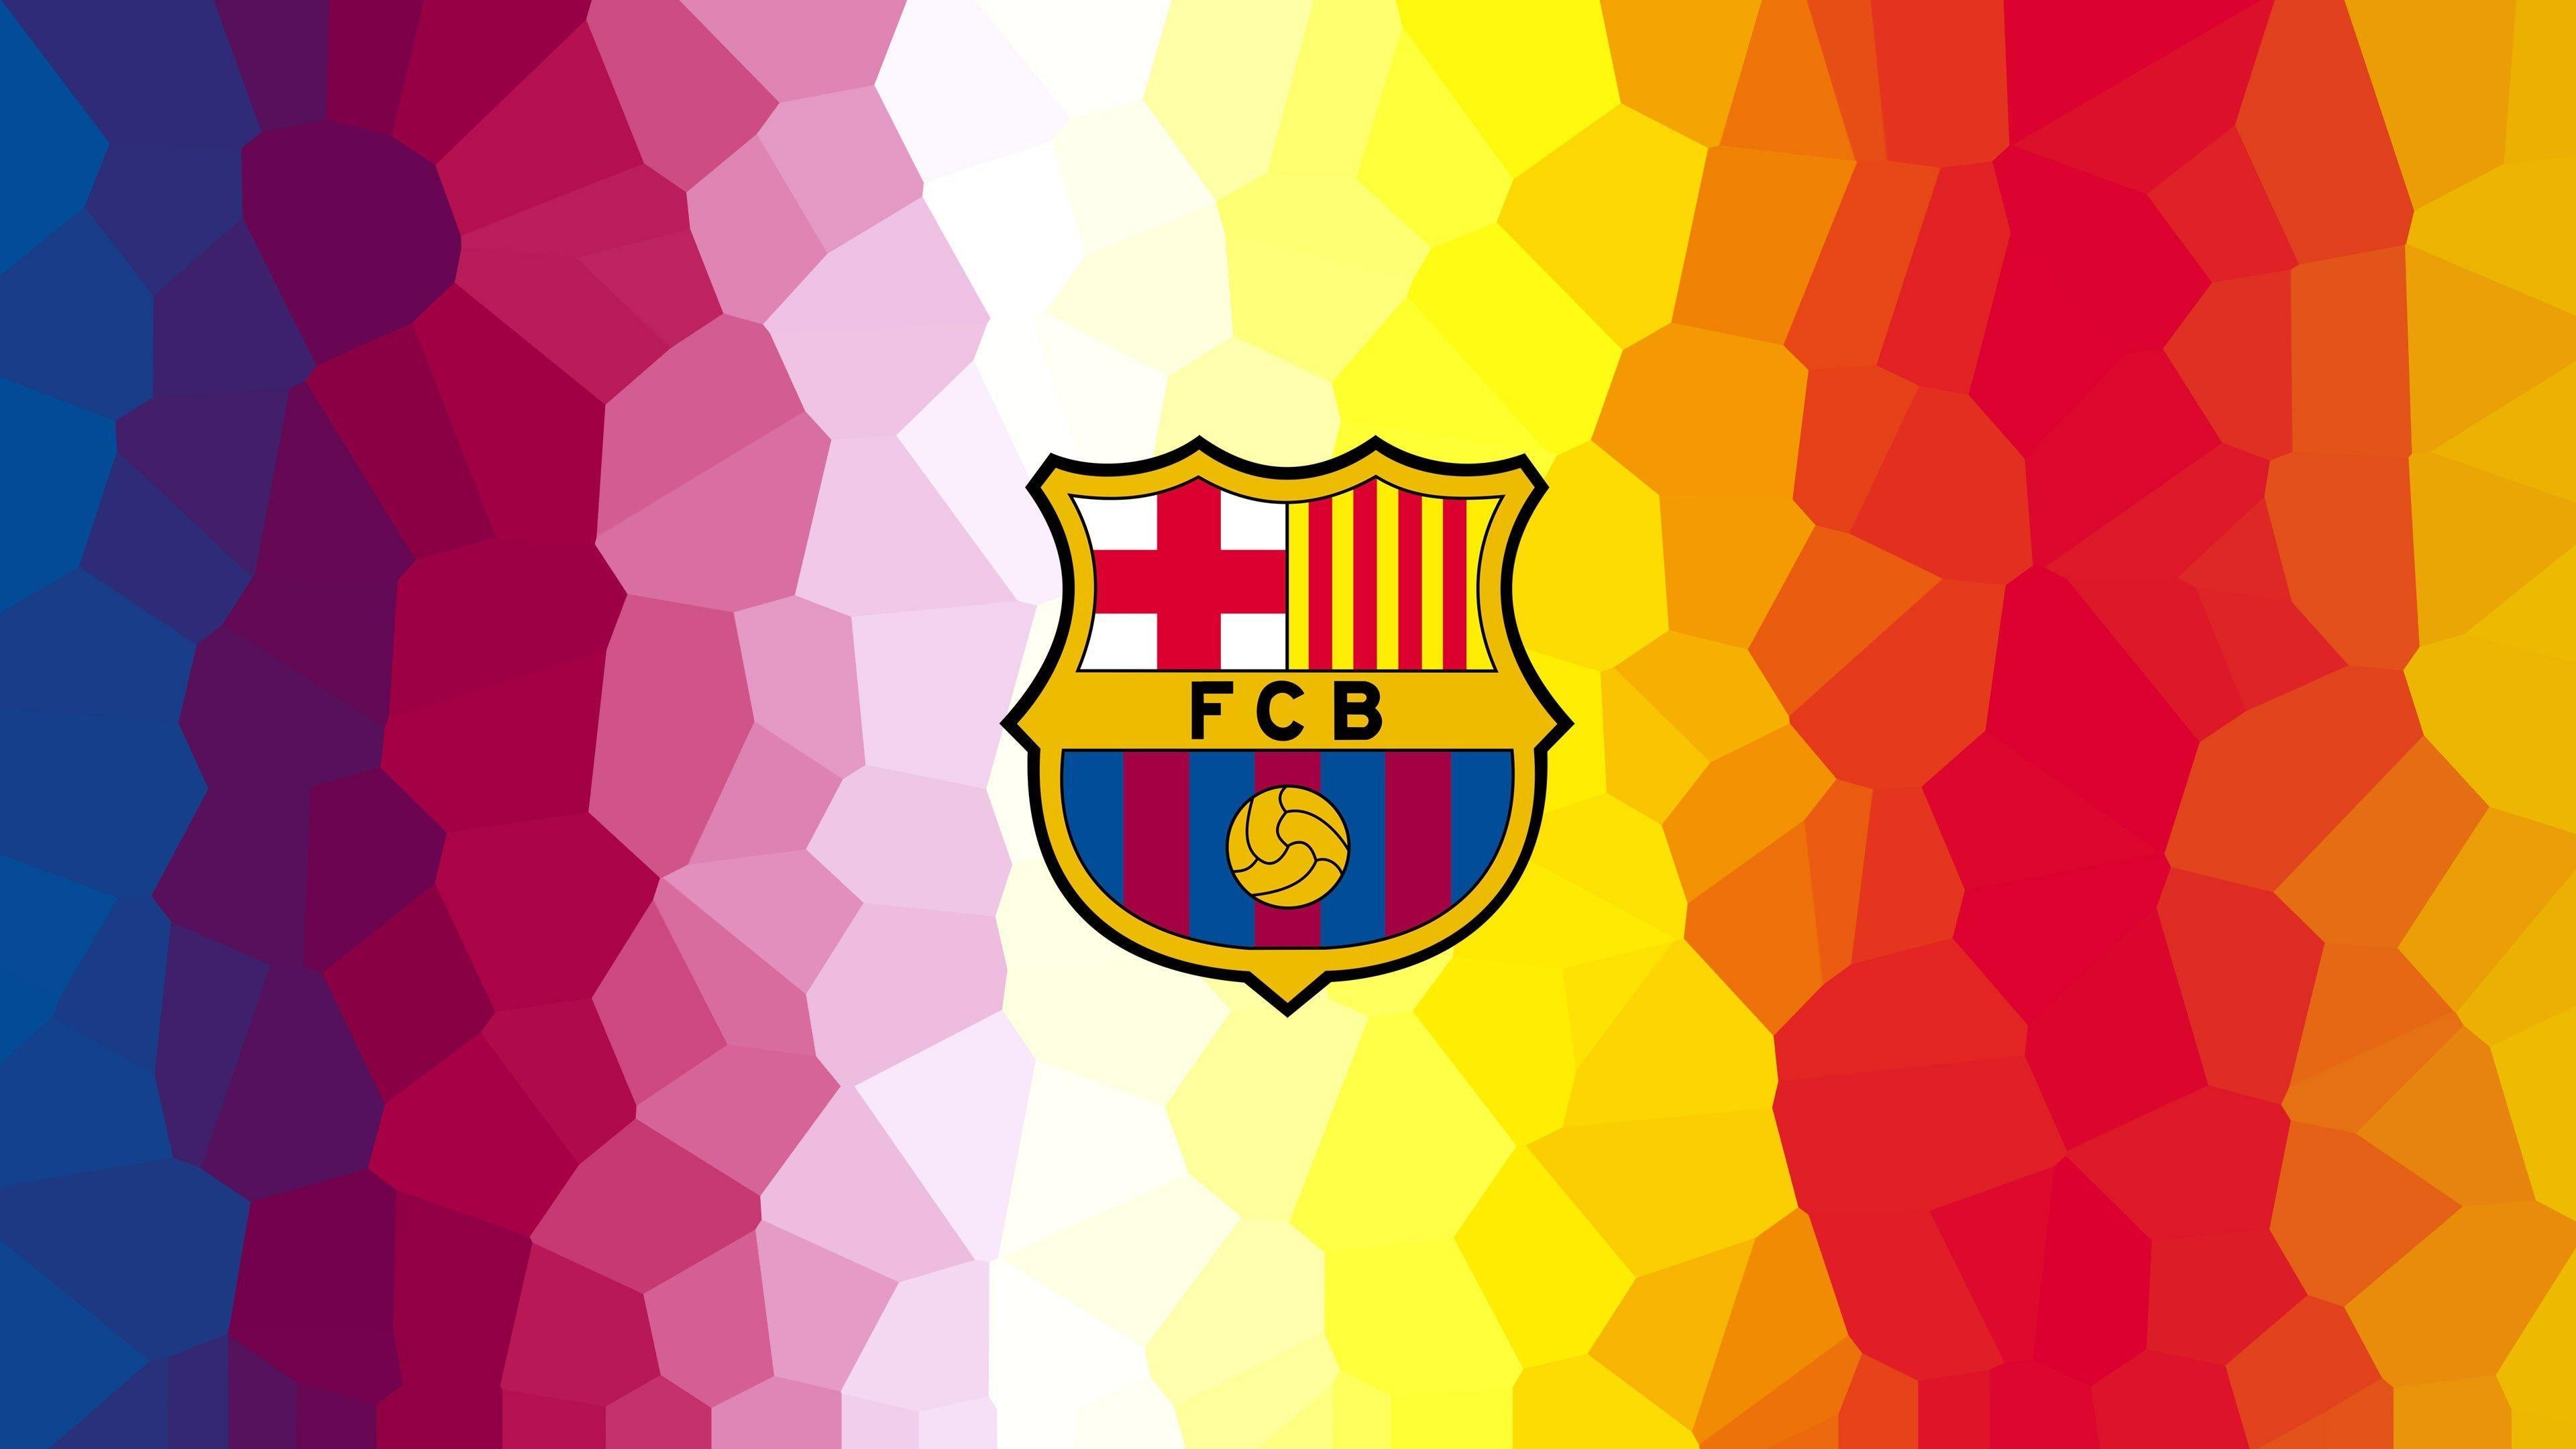 FC Barcelona 2018/2019 Wallpapers - Wallpaper Cave